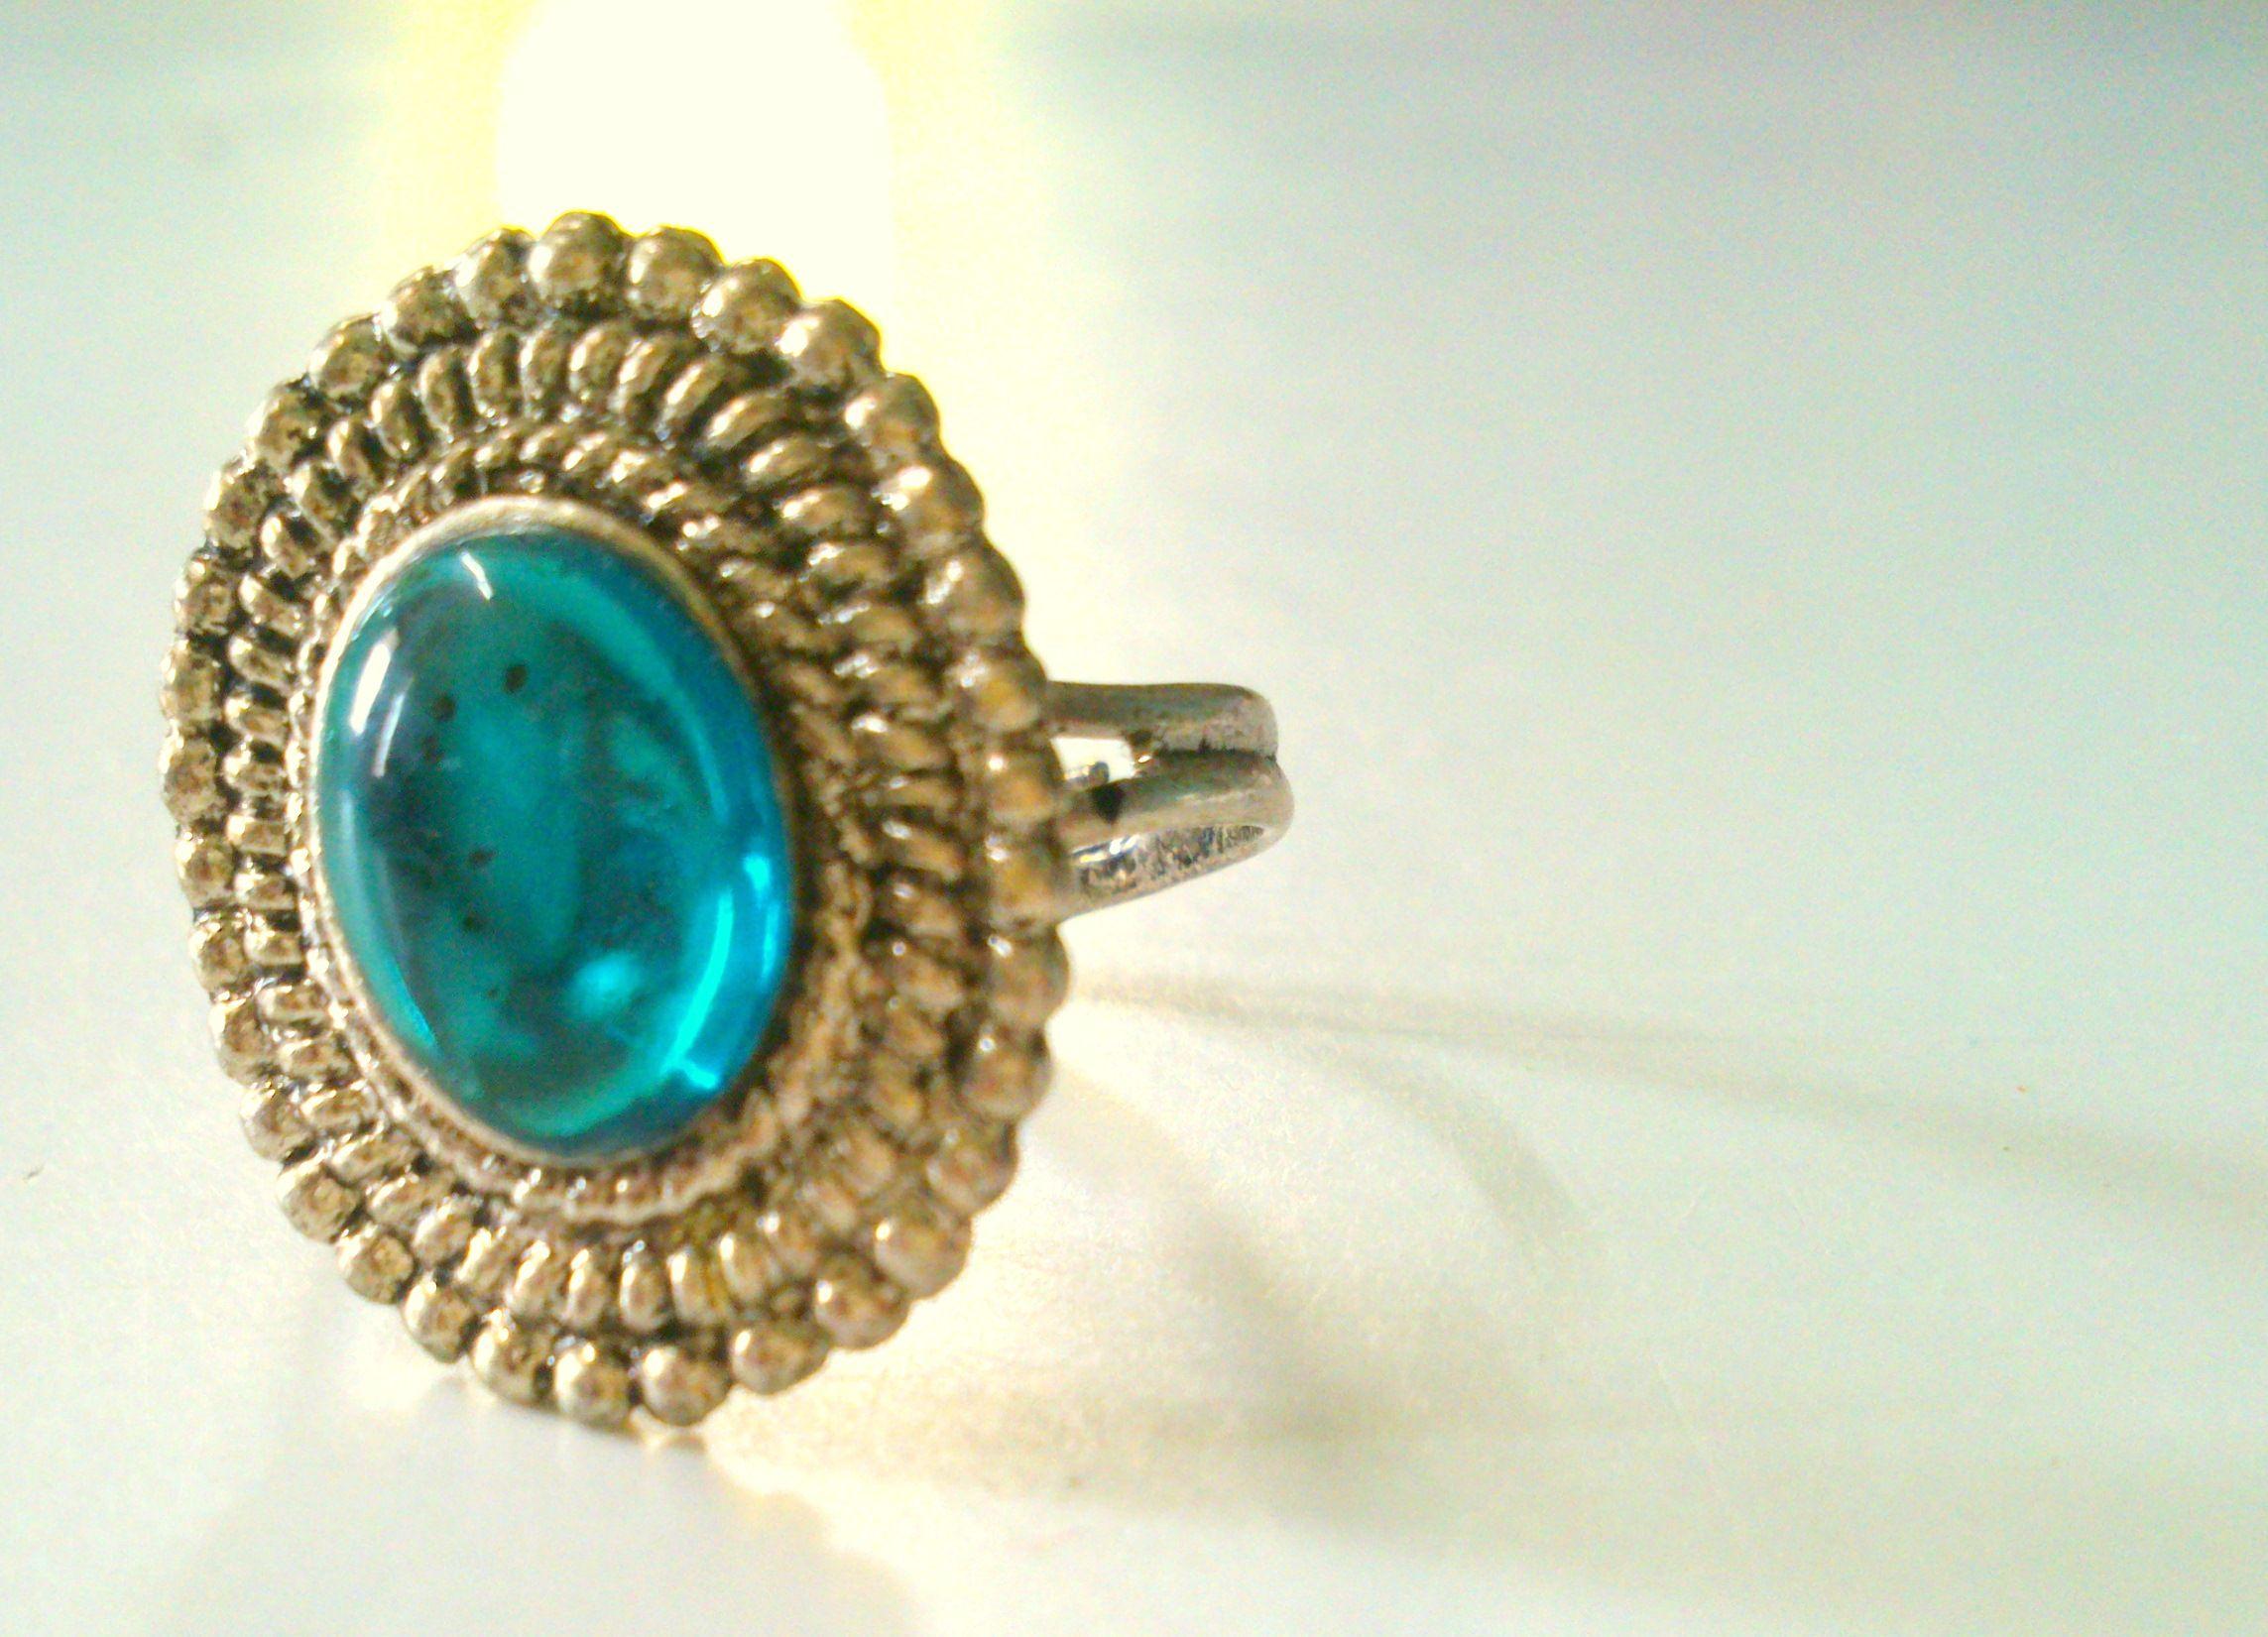 Tiffany & Co. Picasso 18k Yellow Gold XO Brooch Pin   eBay